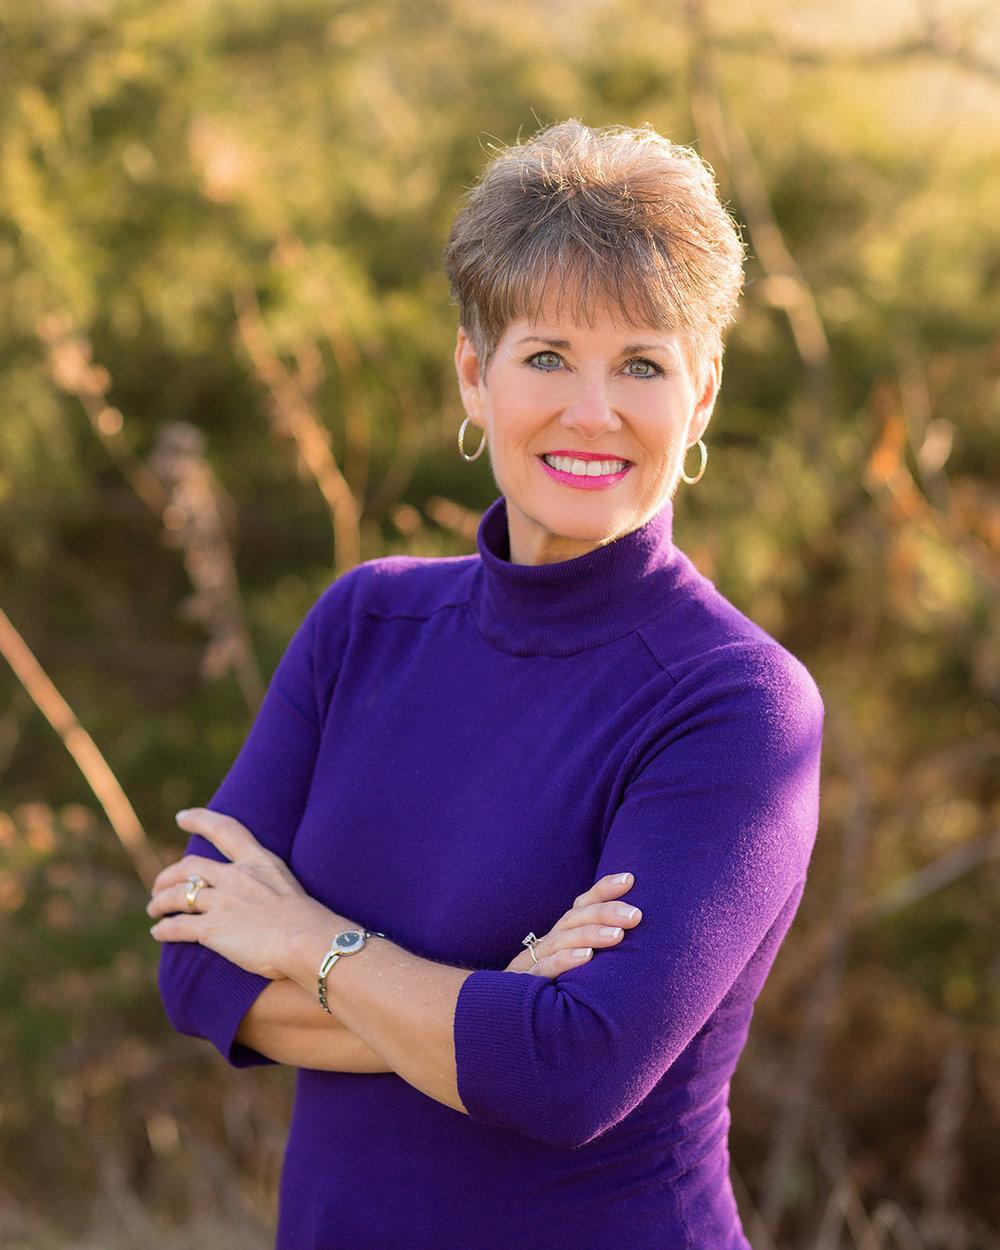 Debbie Amatucci, Professional Photographer